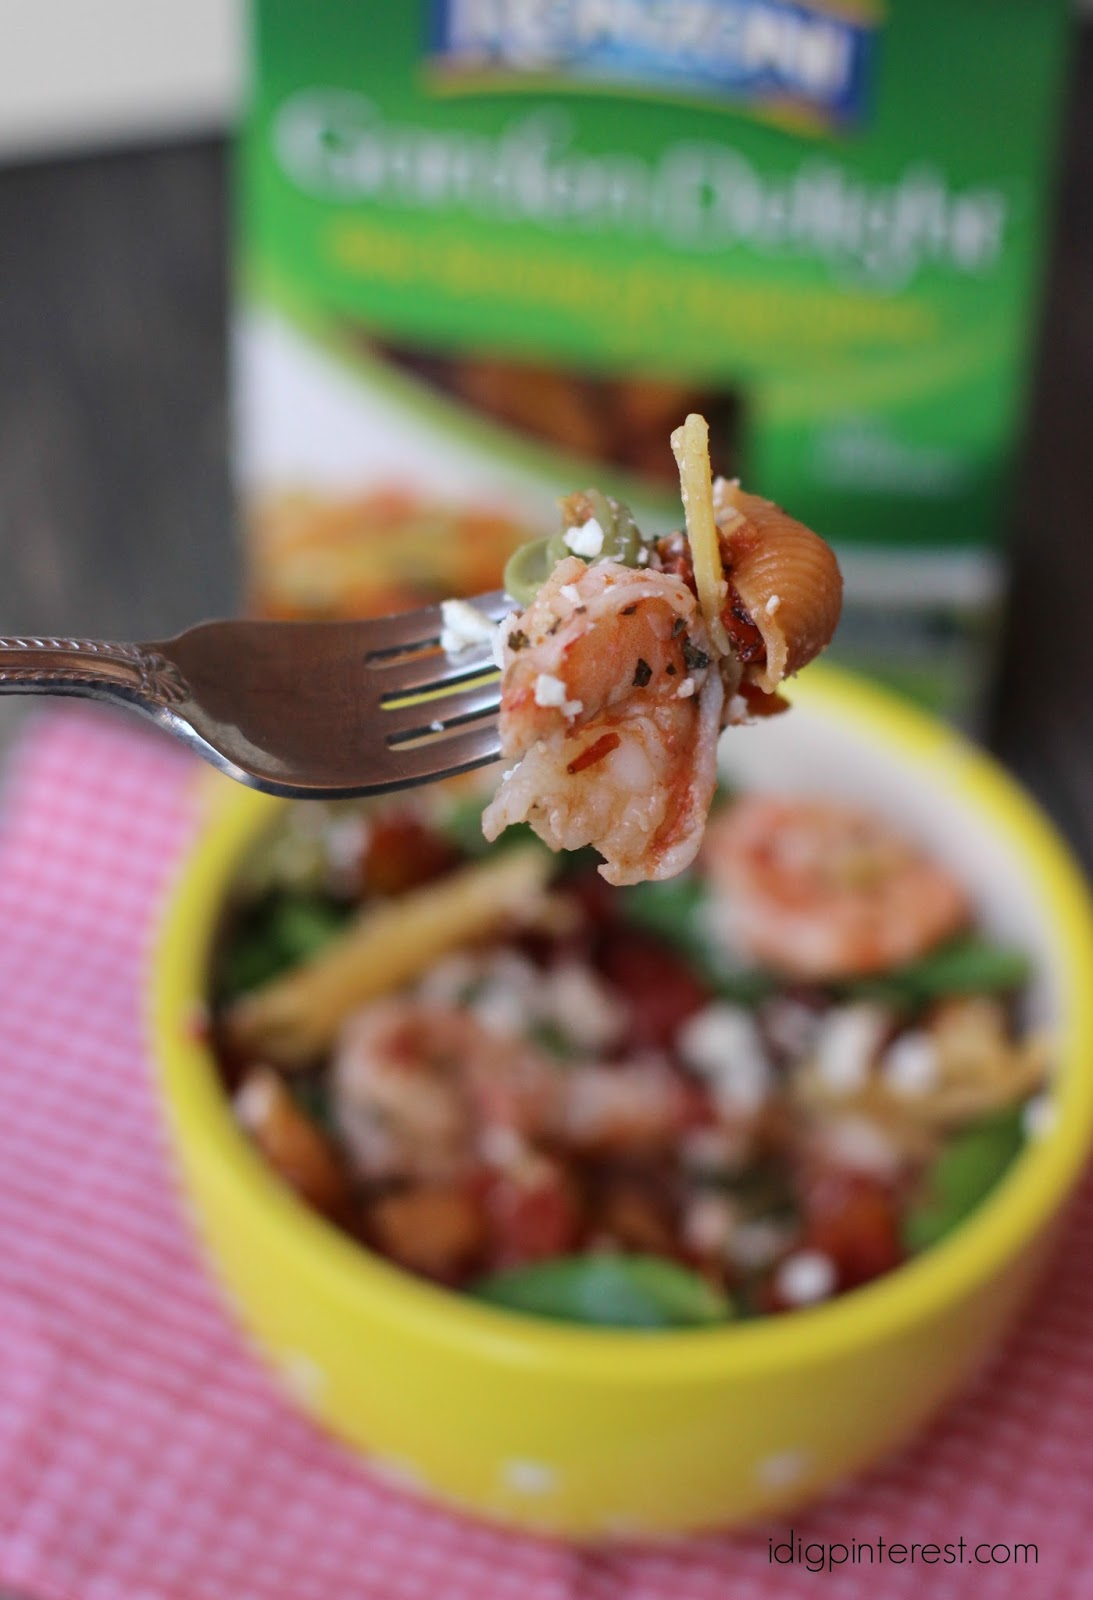 Shrimp and Feta Fire-Roasted Tomato Pasta - I Dig Pinterest